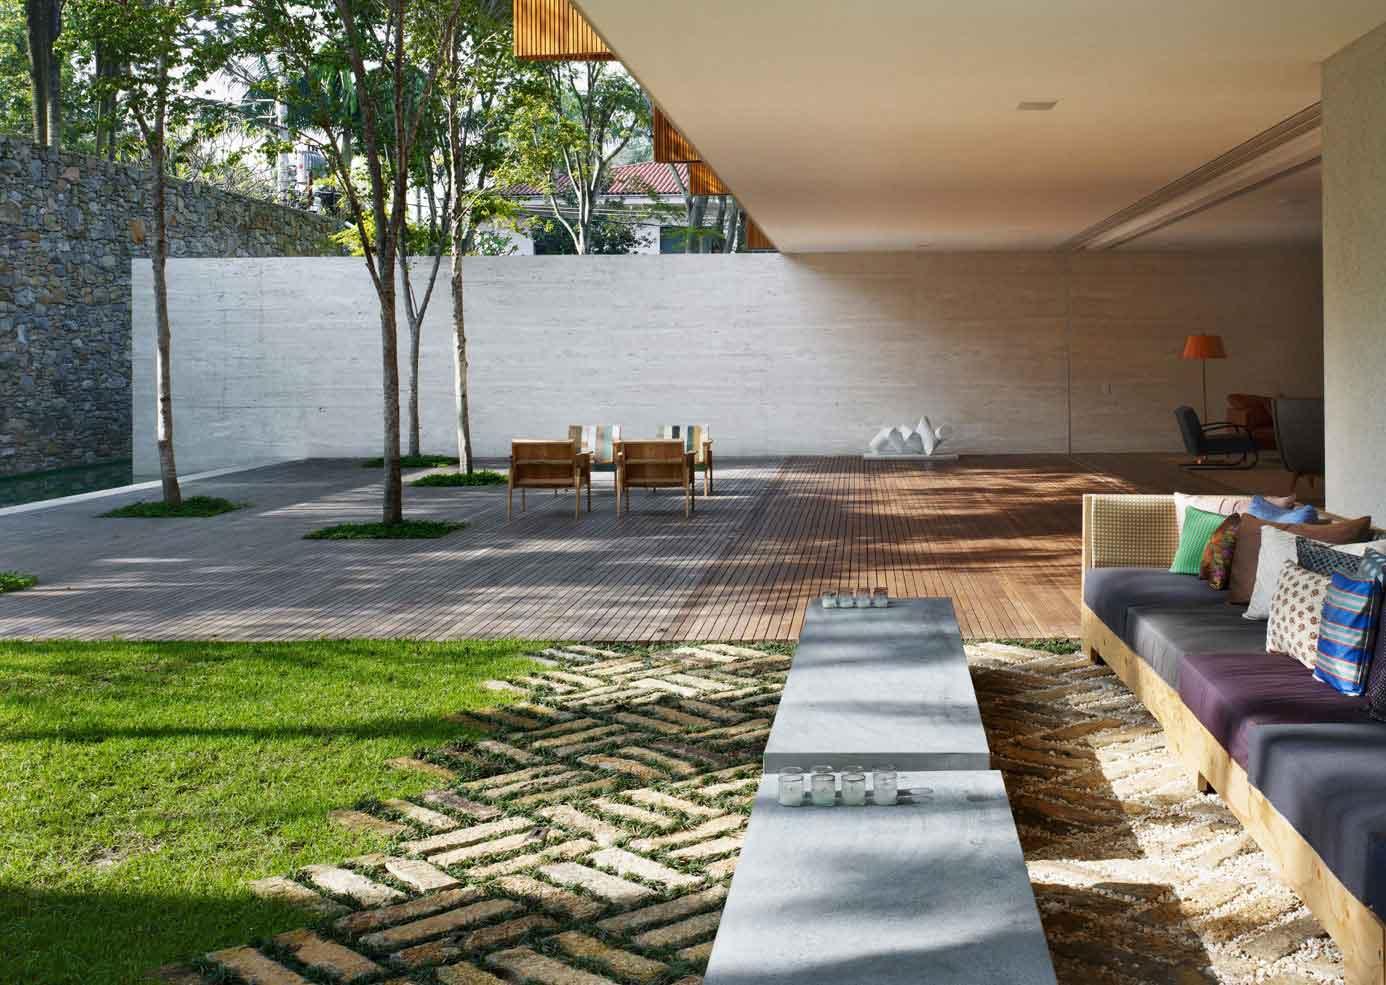 Casa Panama by Studio MK27 | Yellowtrace